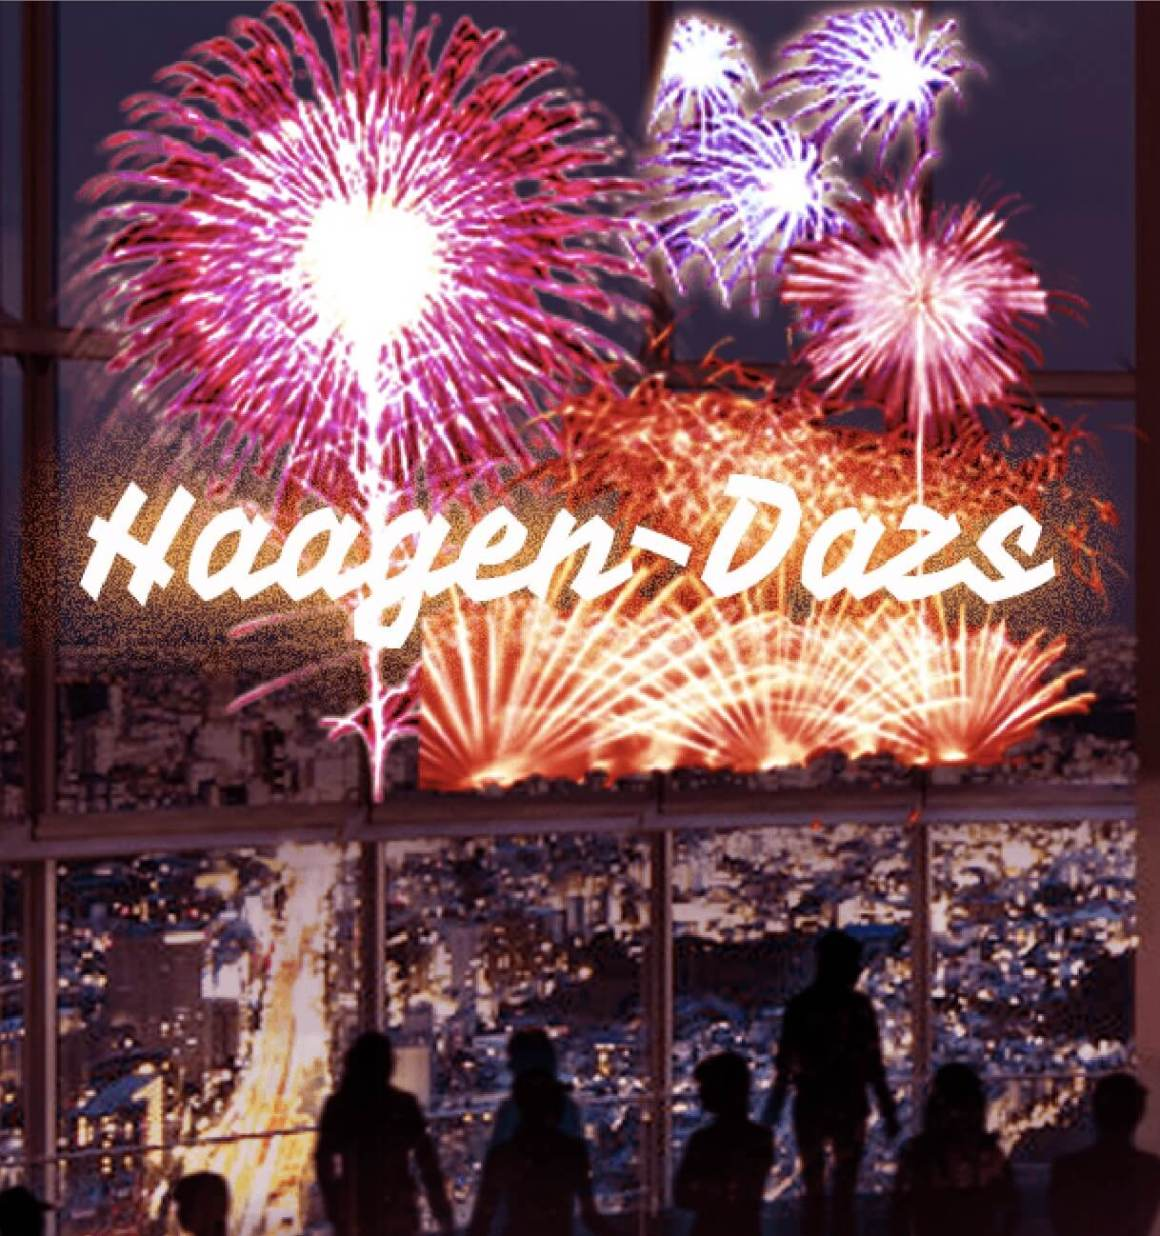 Promosi Menarik Es Krim Haagen Dazs Saat Musim Panas Jepang